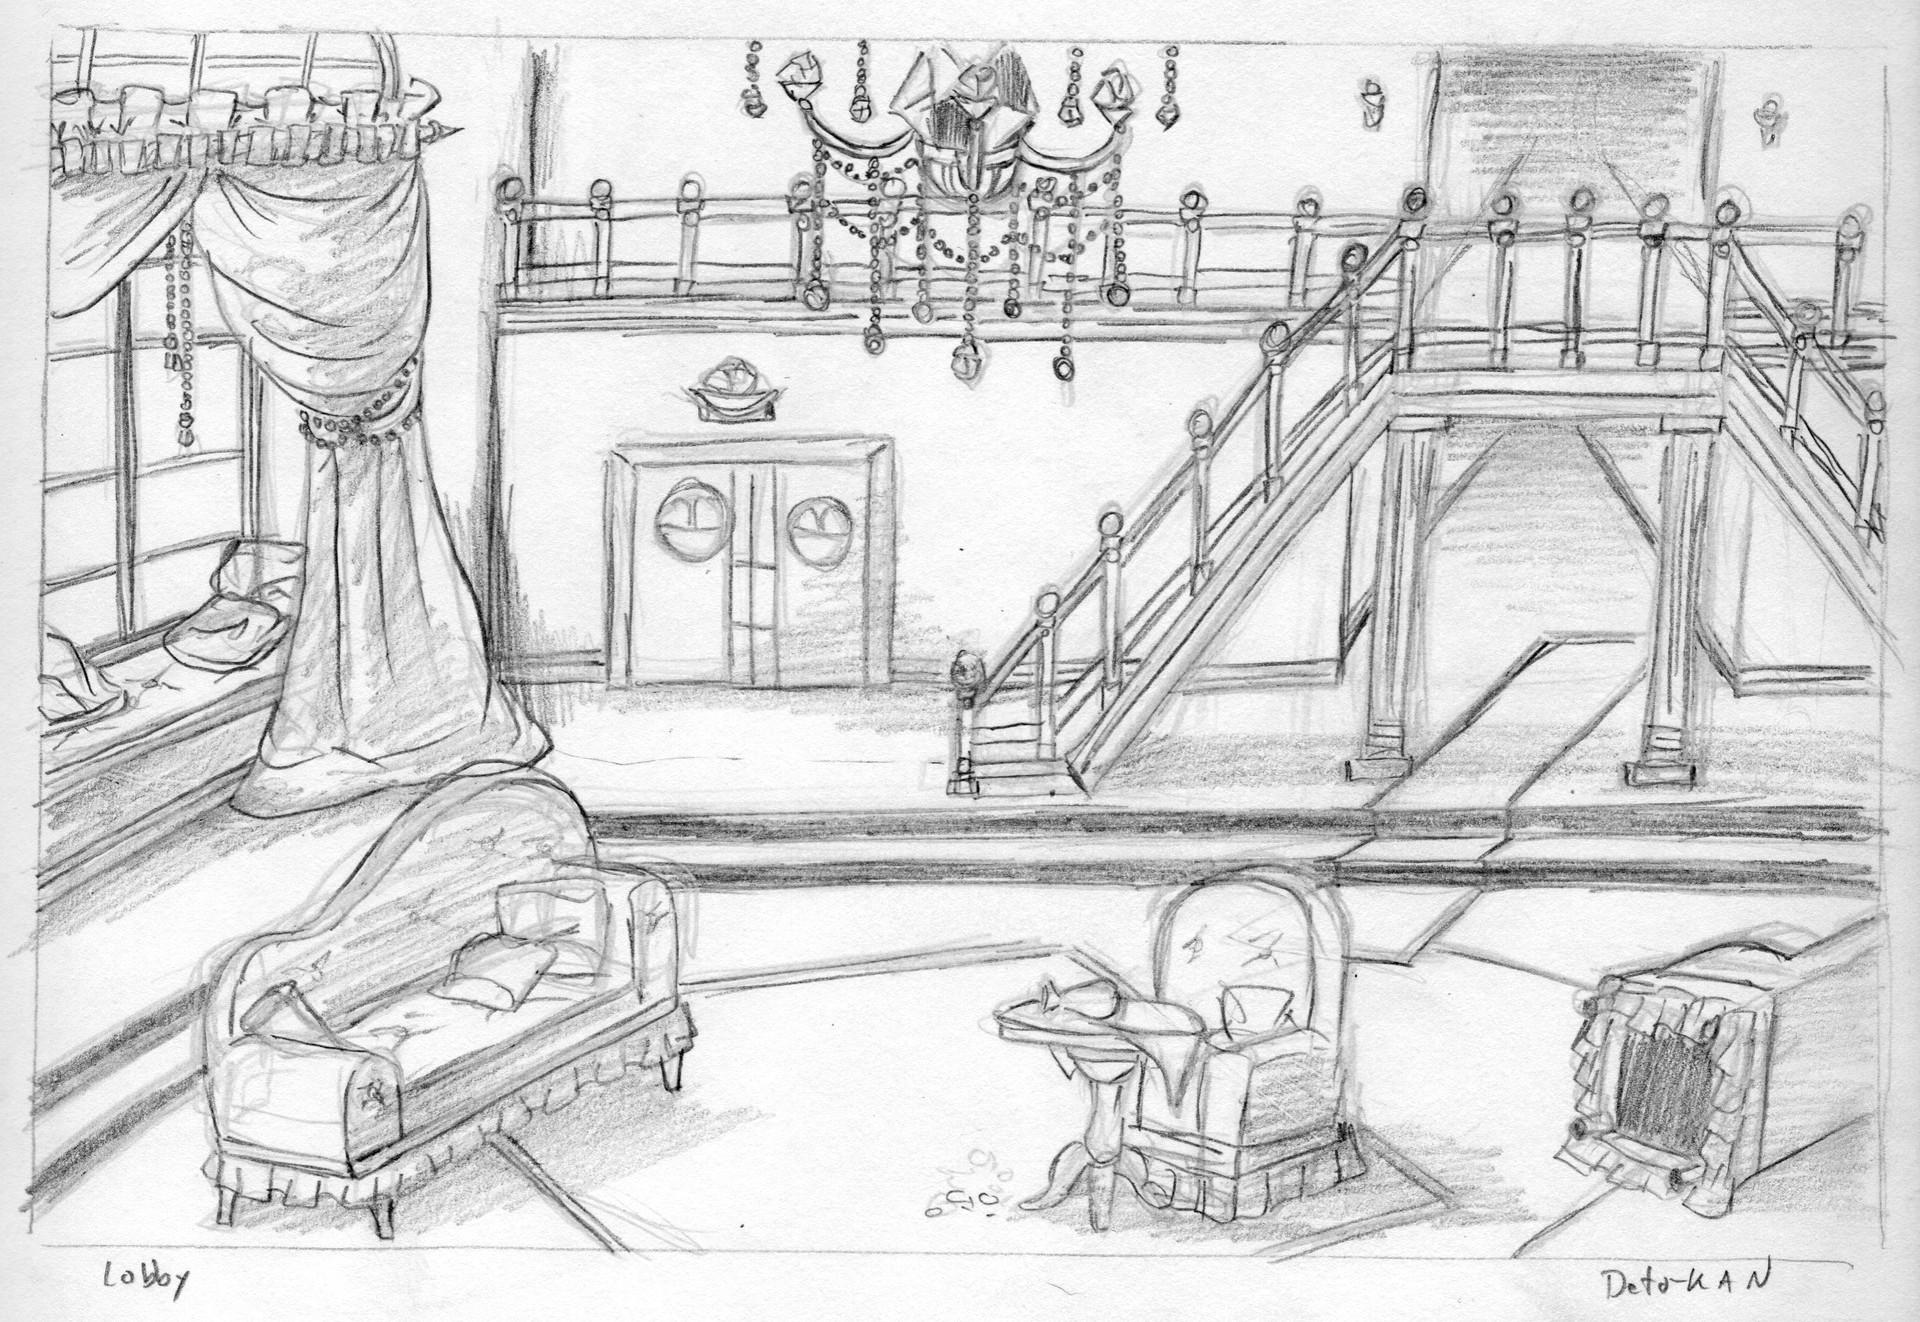 Detonya kan lobby sketch